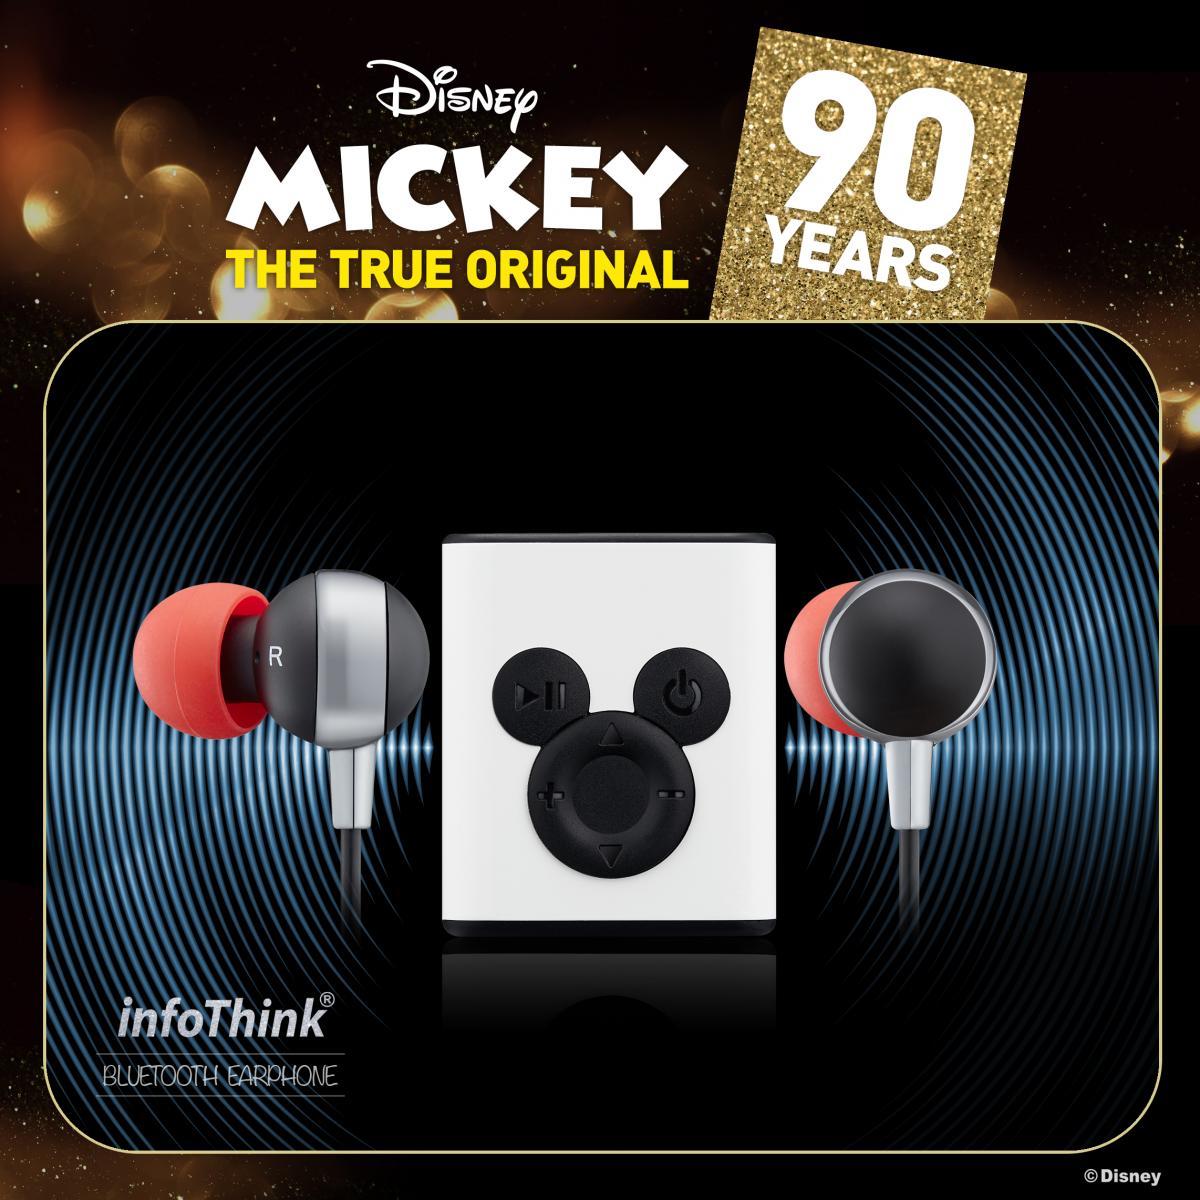 Disney迪士尼 infoThink 米奇系列藍牙耳機 (背面夾式設計) 重低音耳機